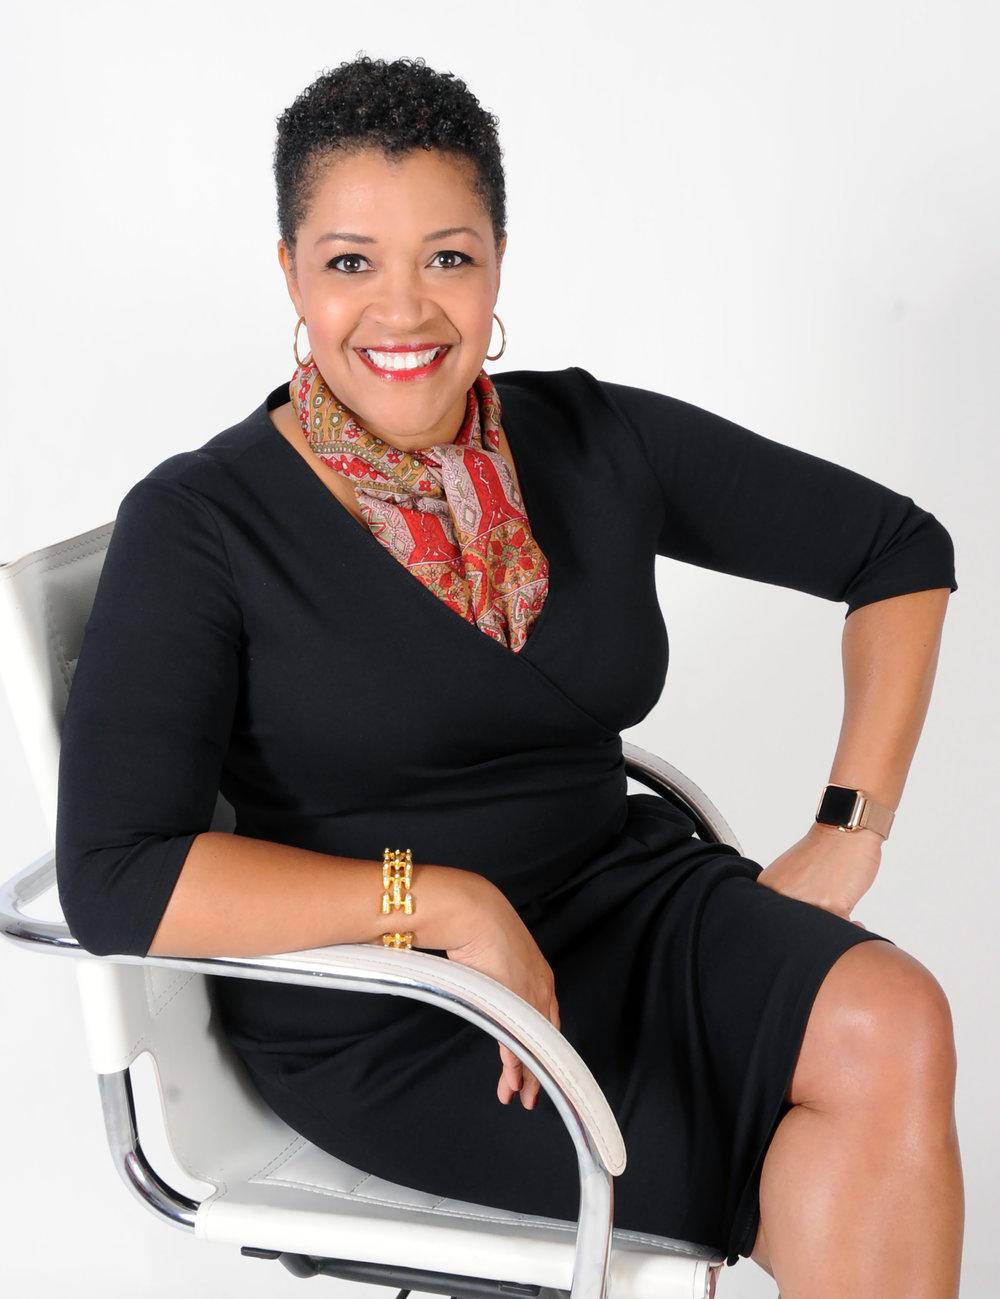 Leilani M. Brown